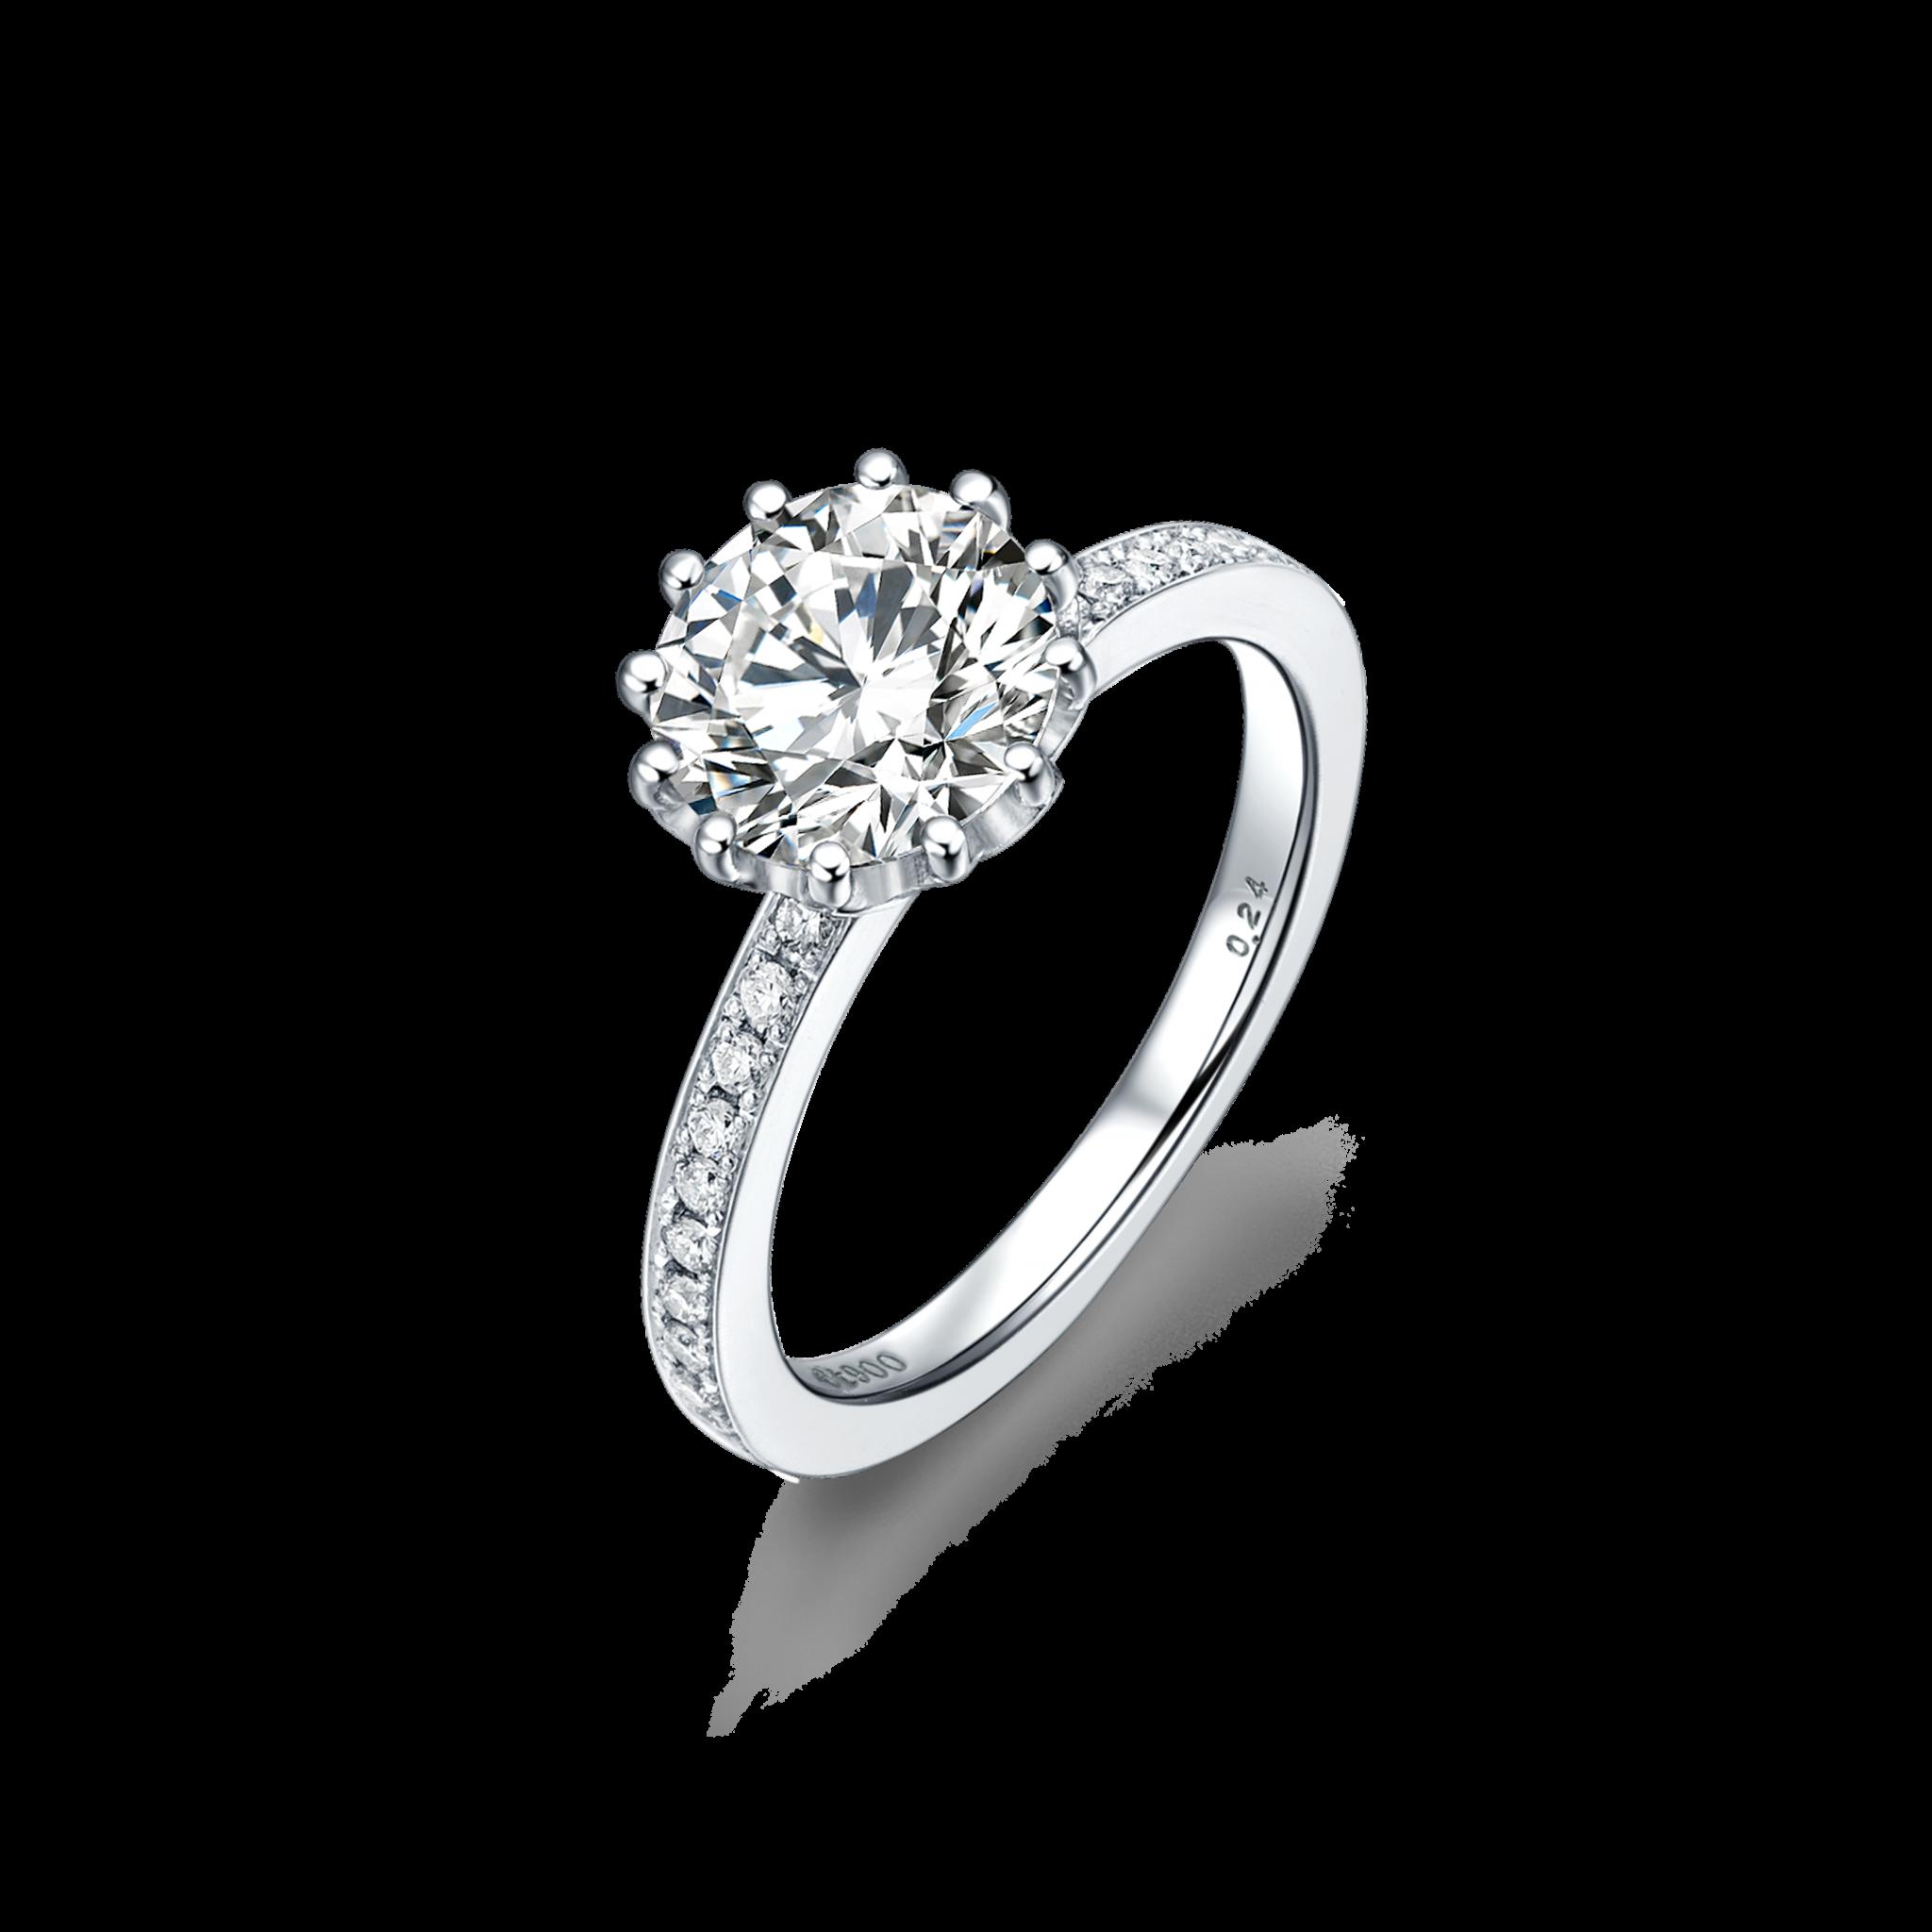 Magnolia Collection 900铂金单钻戒指2 戒托- ¥12399